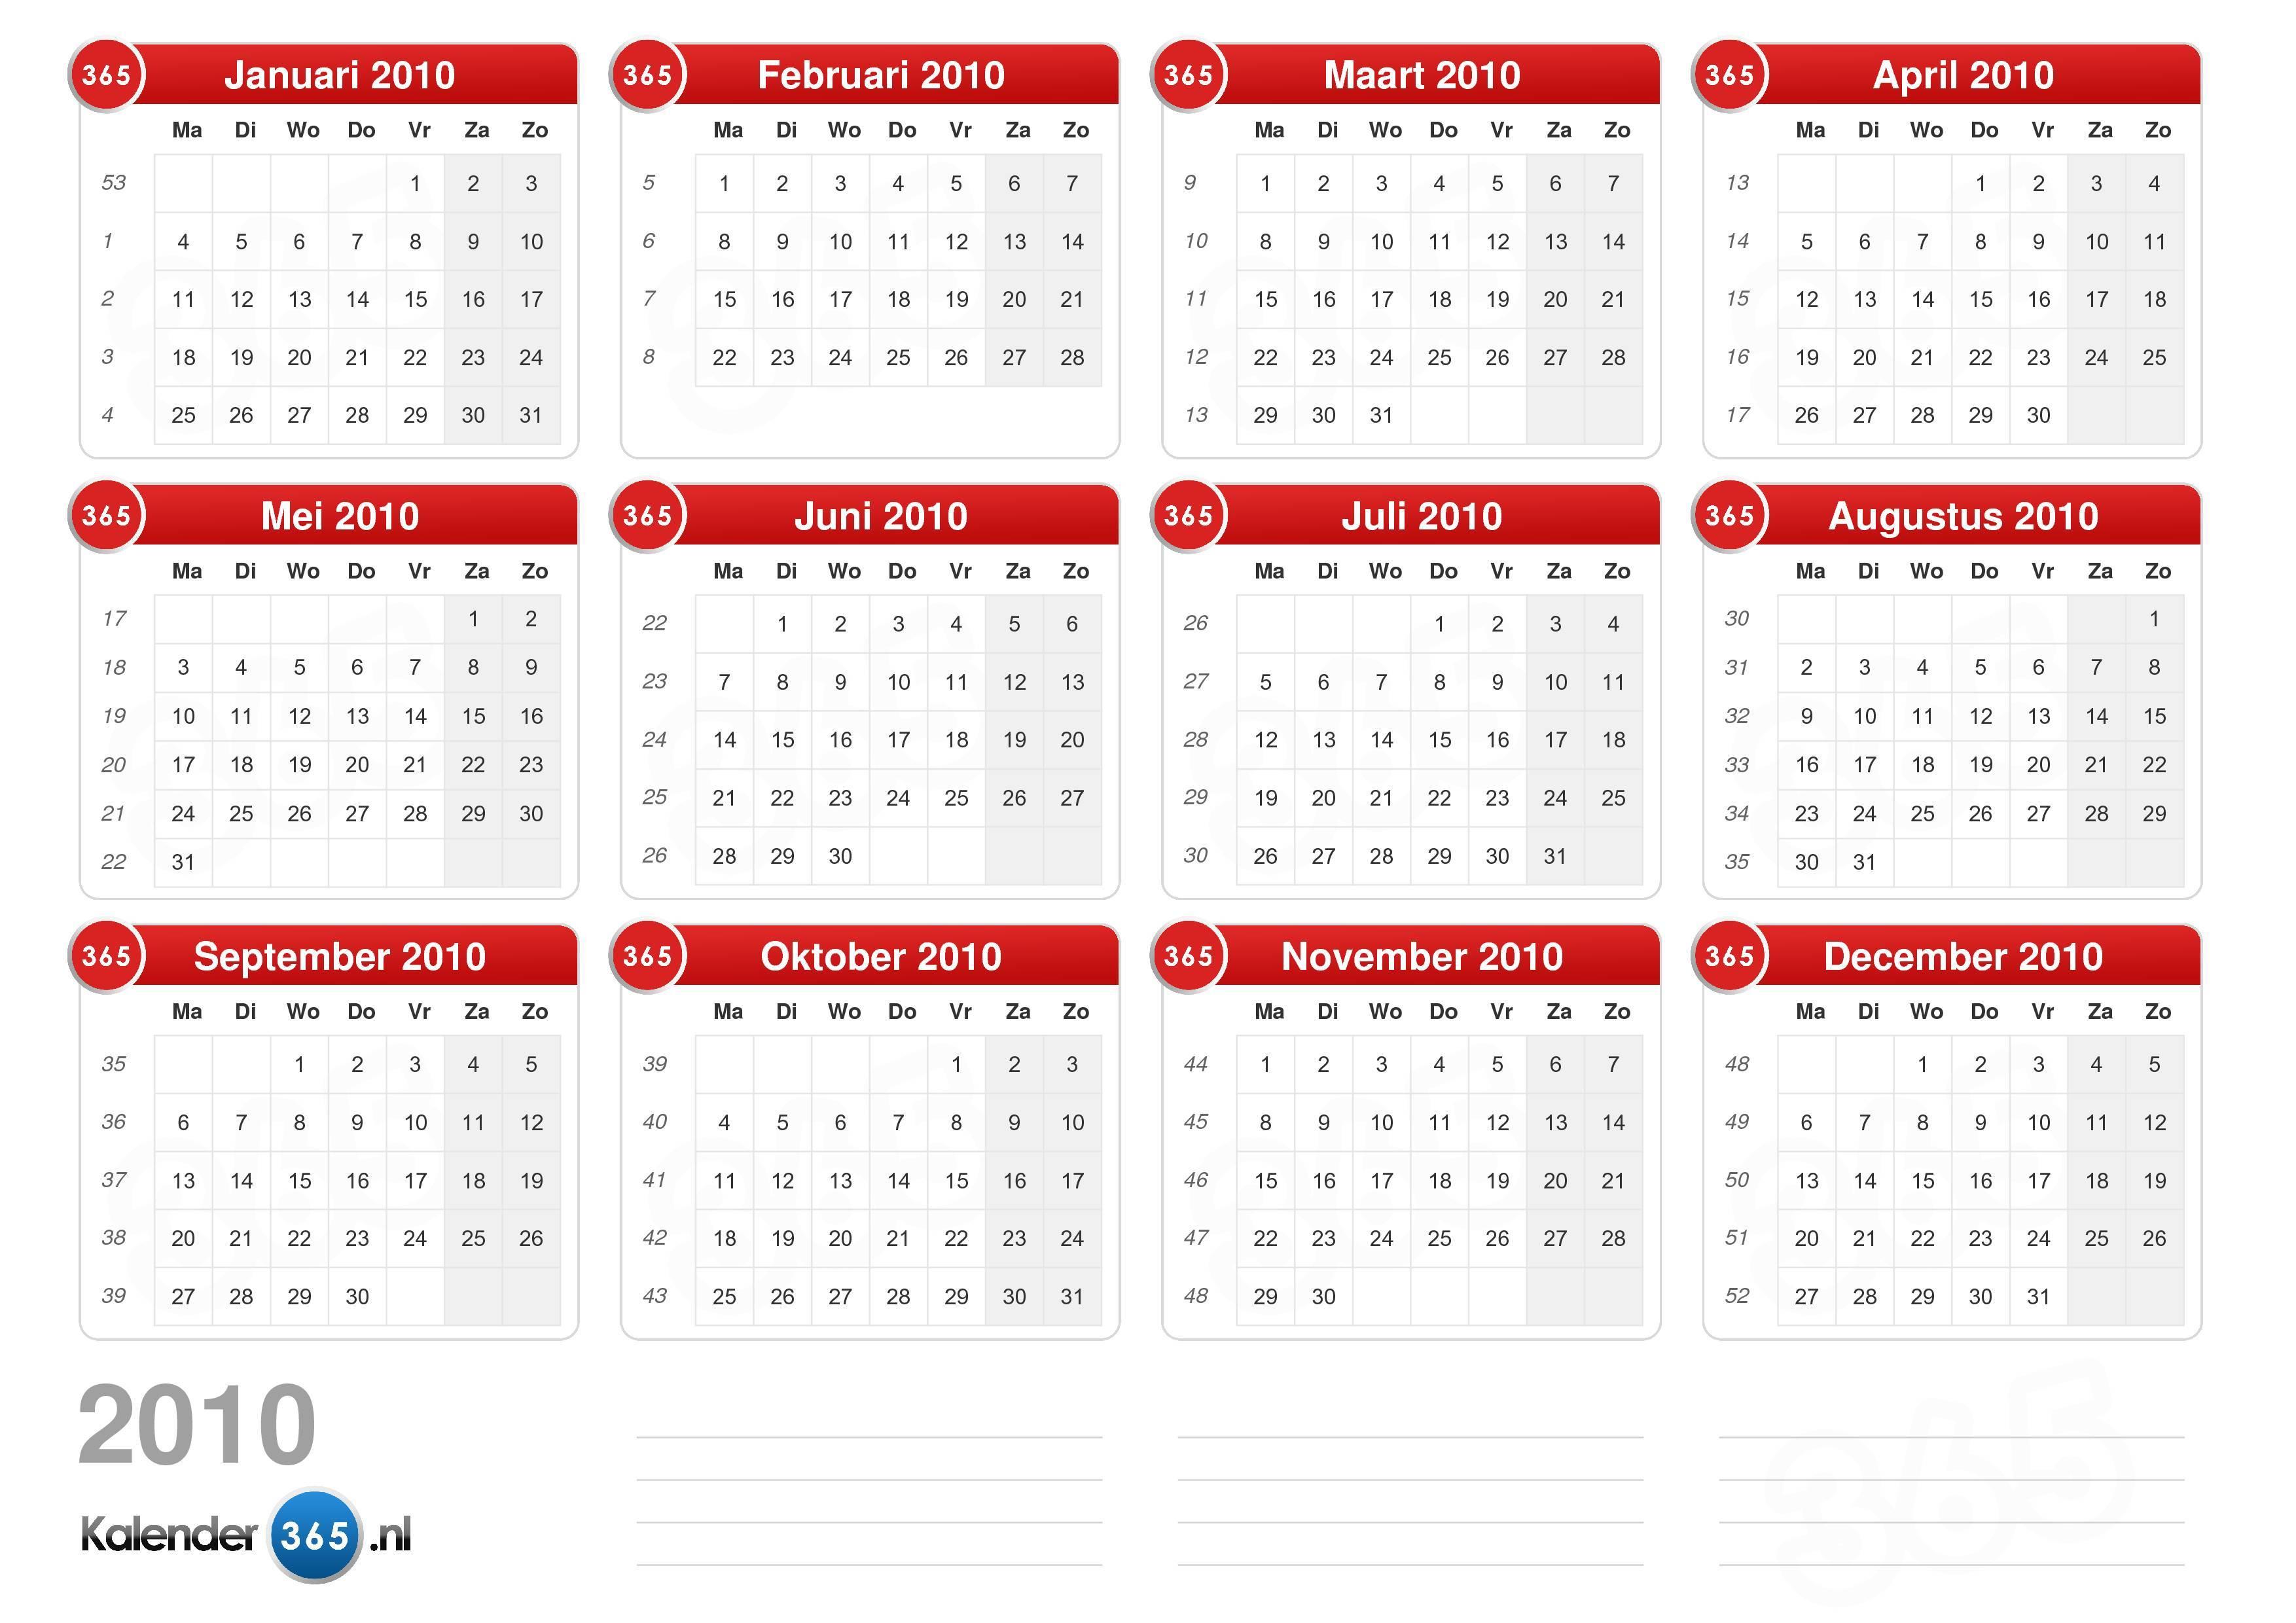 cf9f241ce35 Kalender 2010 (v2)